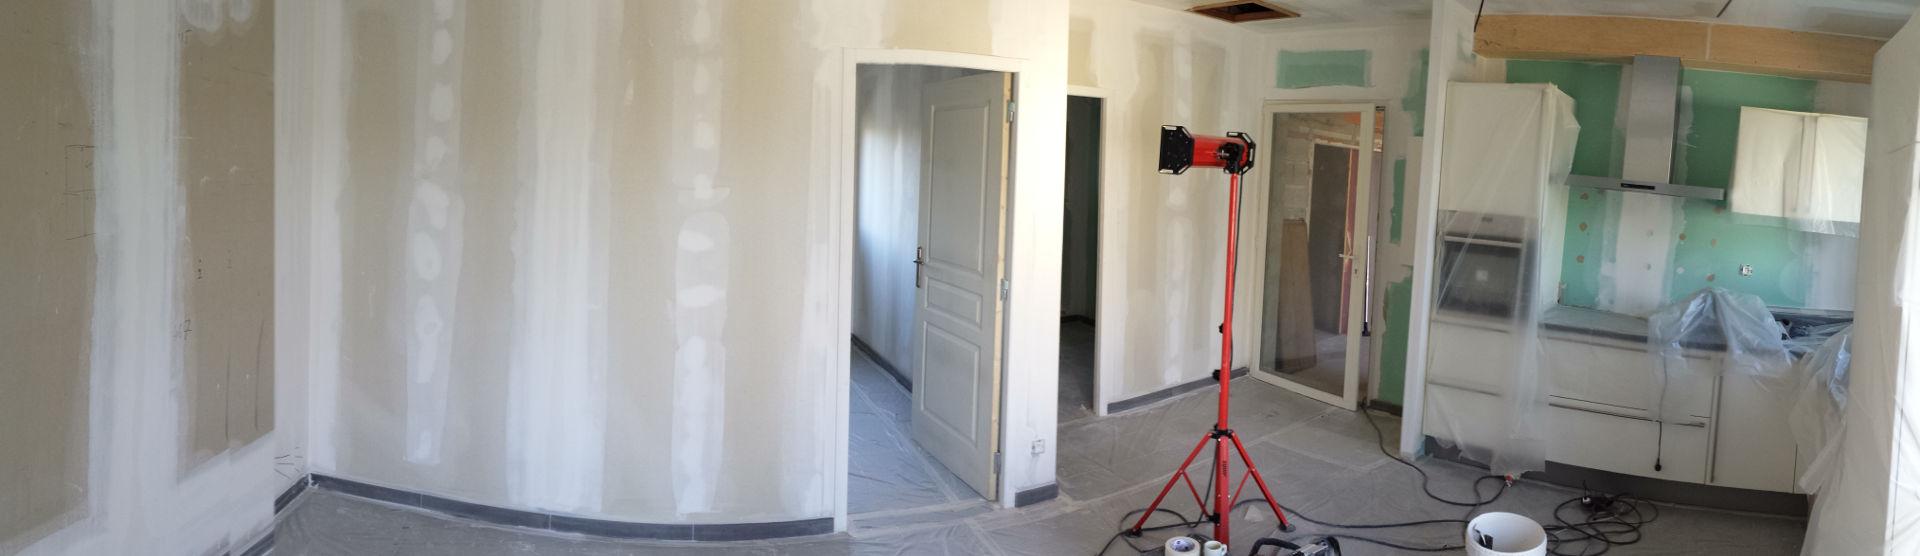 Peinture appartement neuf Avignon avant